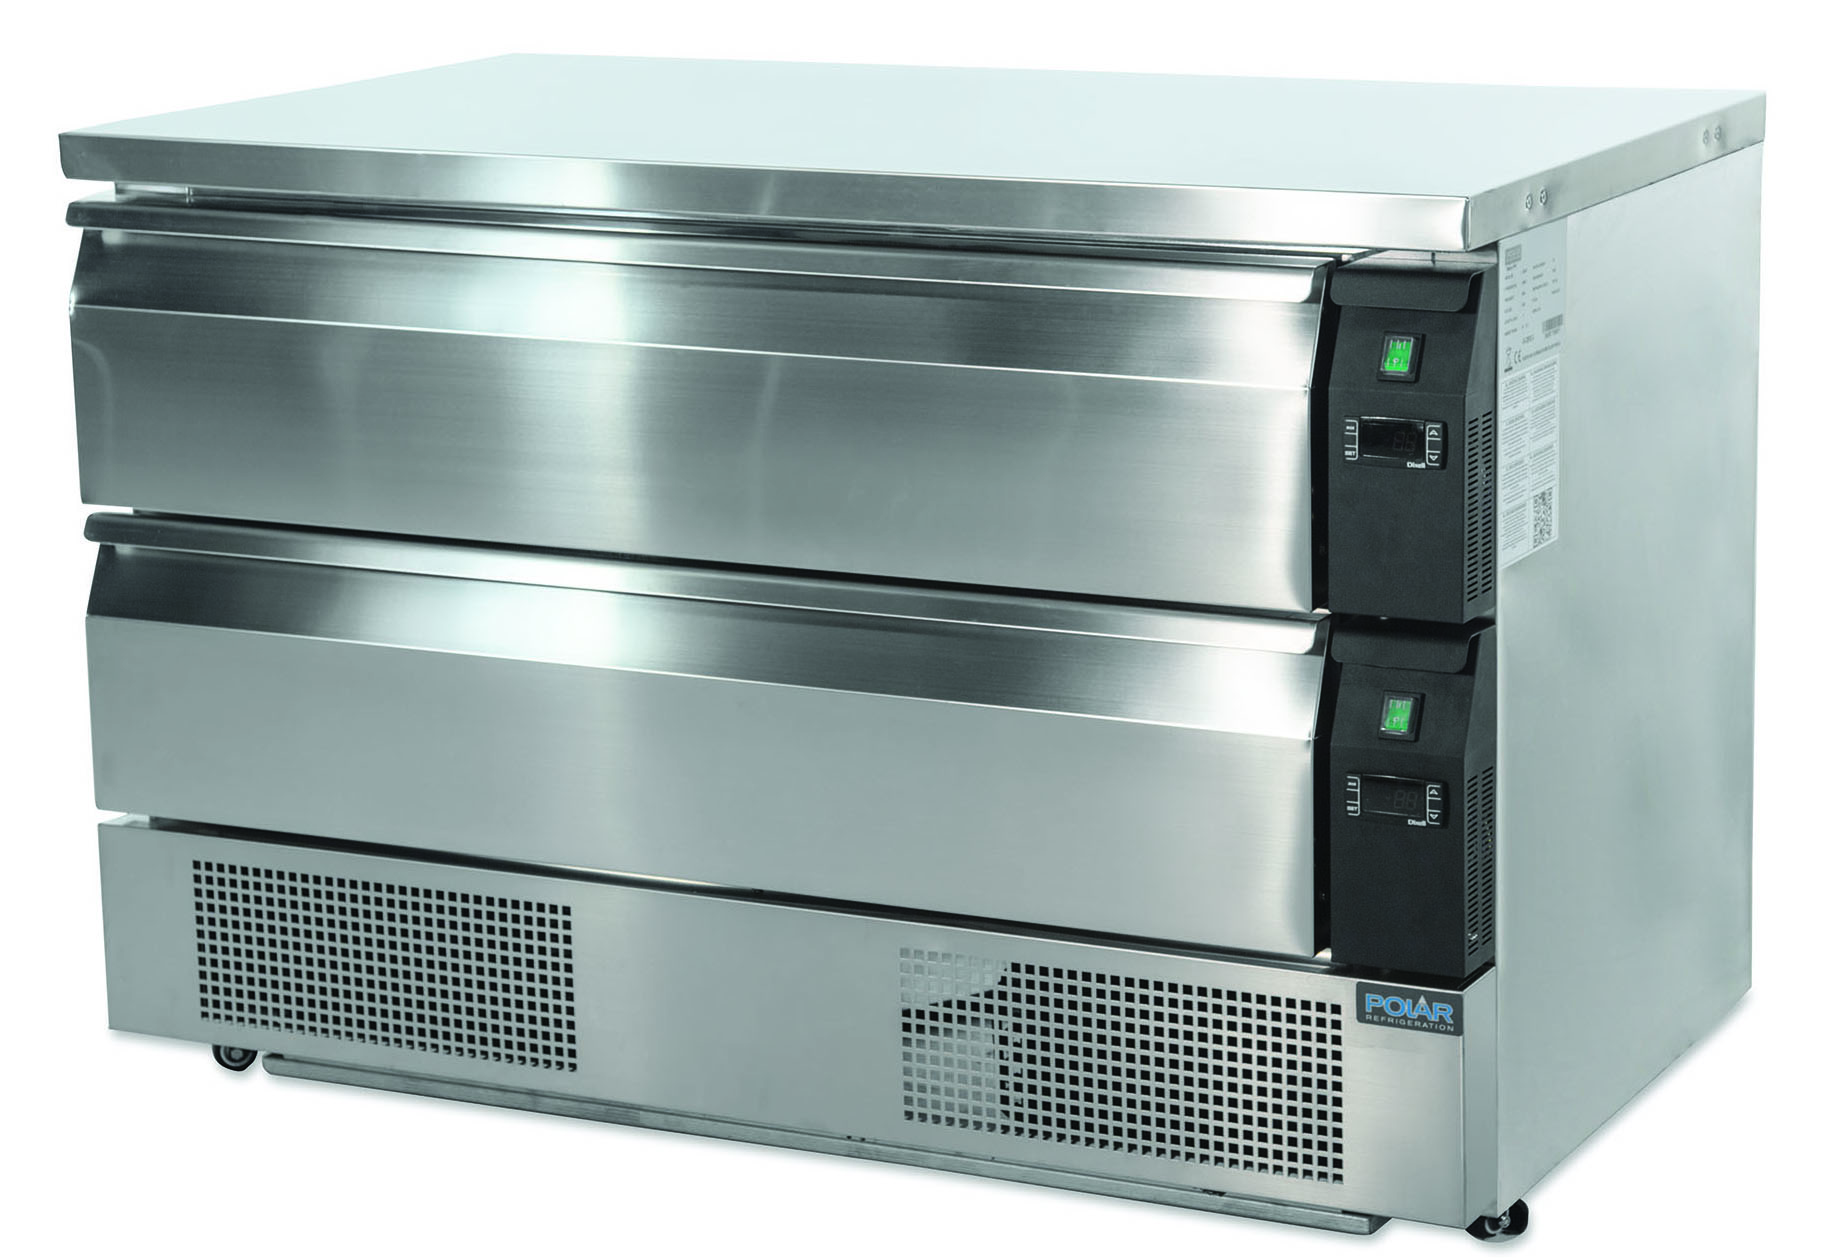 DA997 double drawer counter